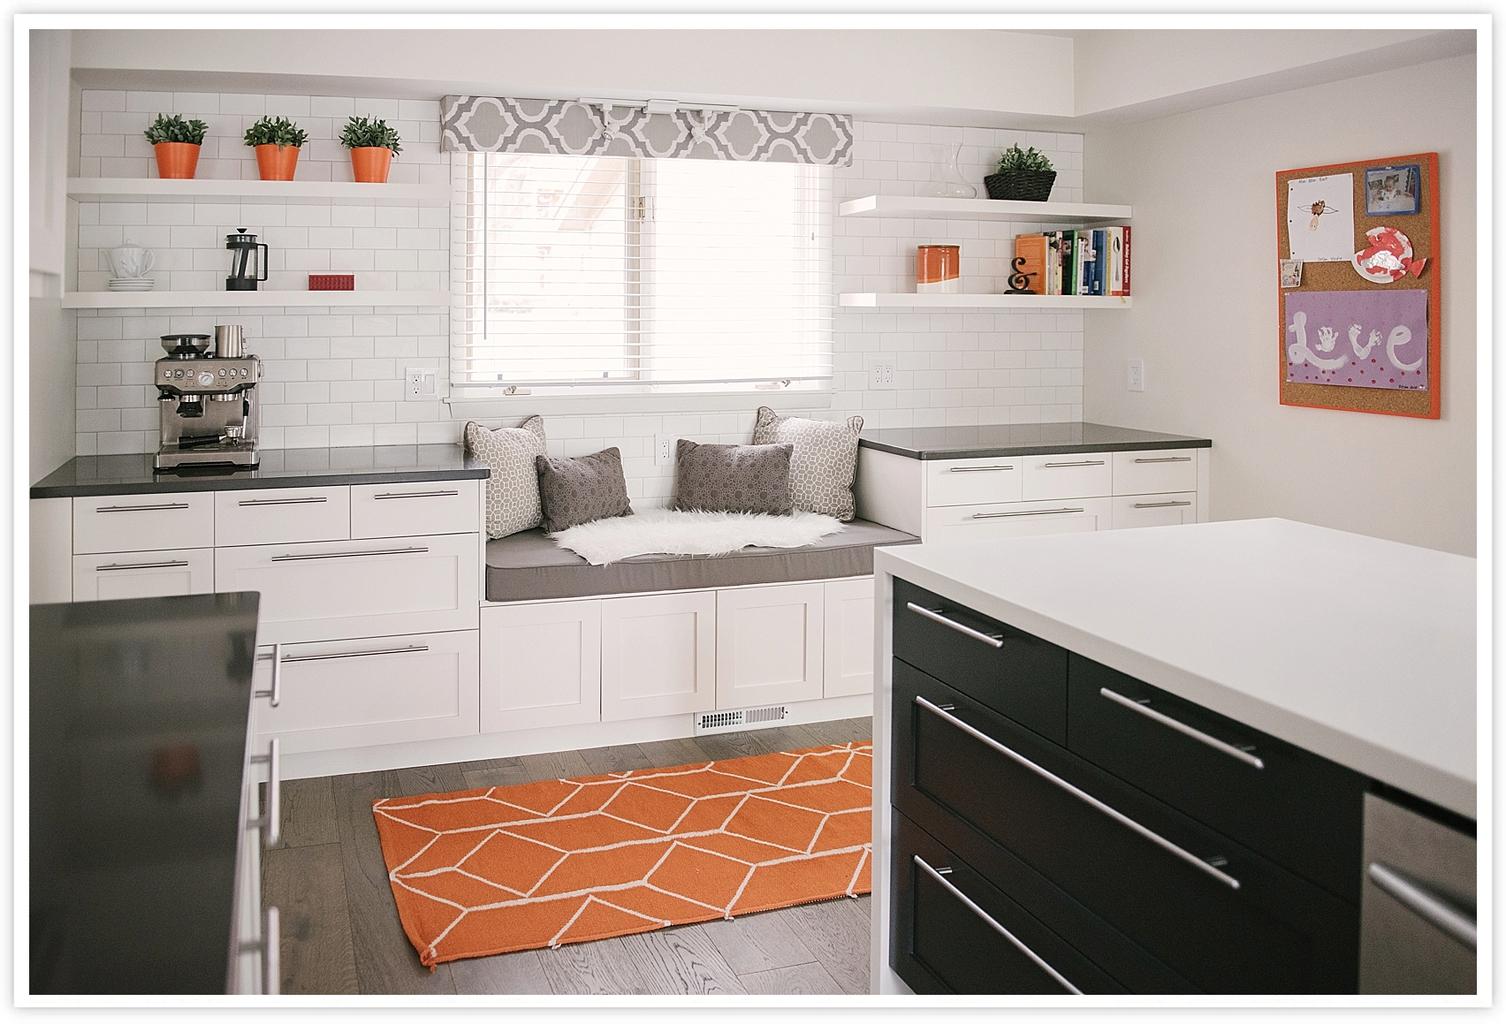 Ikea Semihandmade Kitchen Renovation Before And After